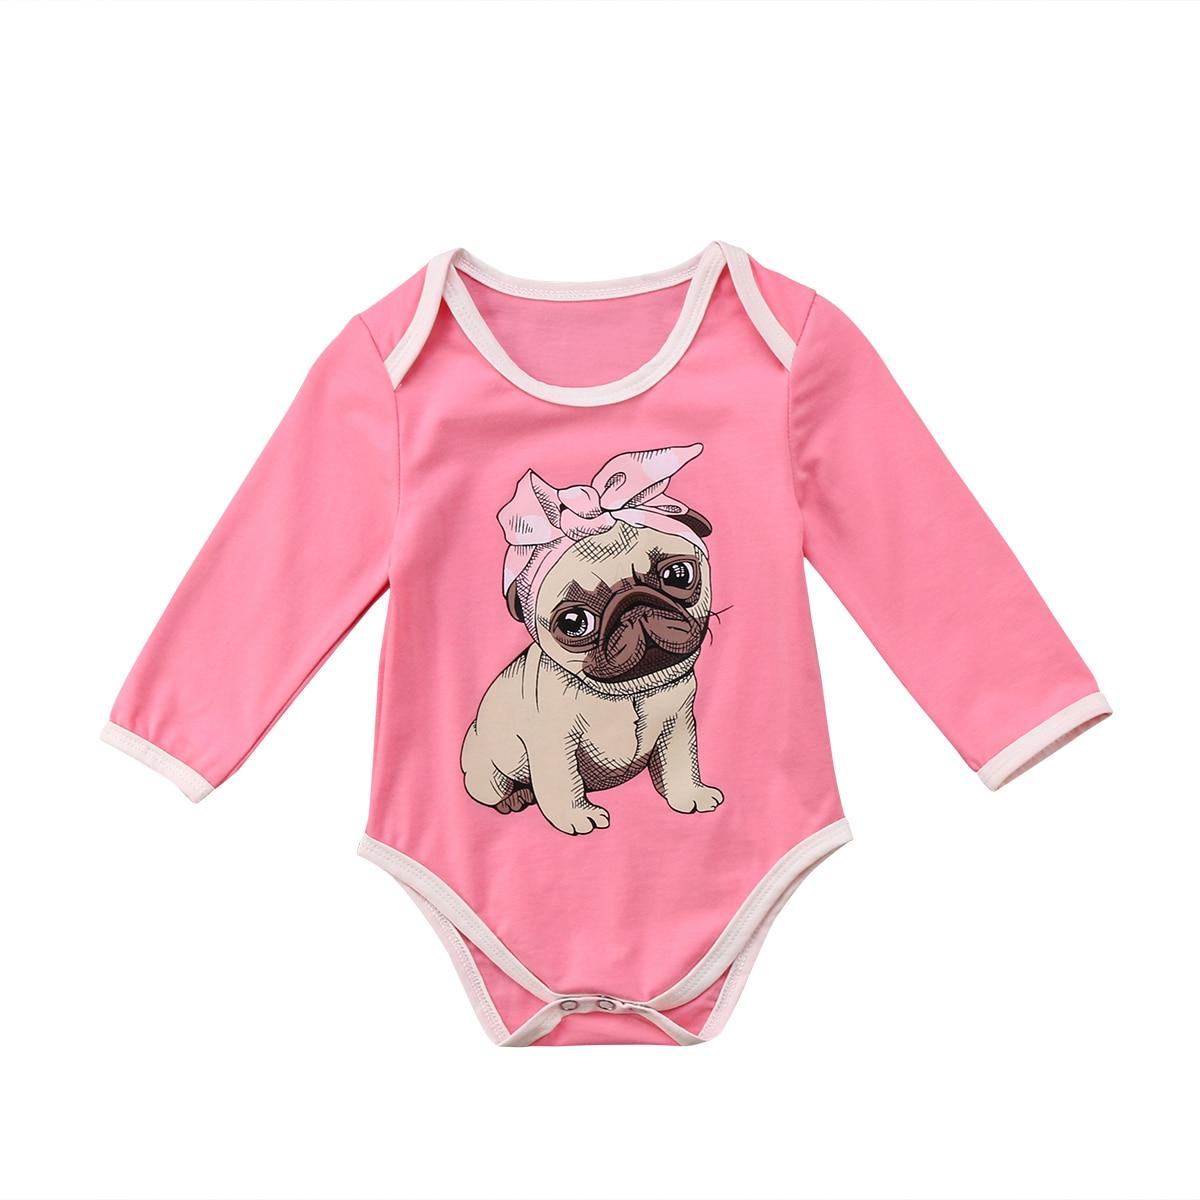 Diszipliniert 2018 Süße Kinder Baby Mädchen Rosa Strampler Bulldog Drucken Overall Outfits Langarm Rosa Frühling Nette Kleidung